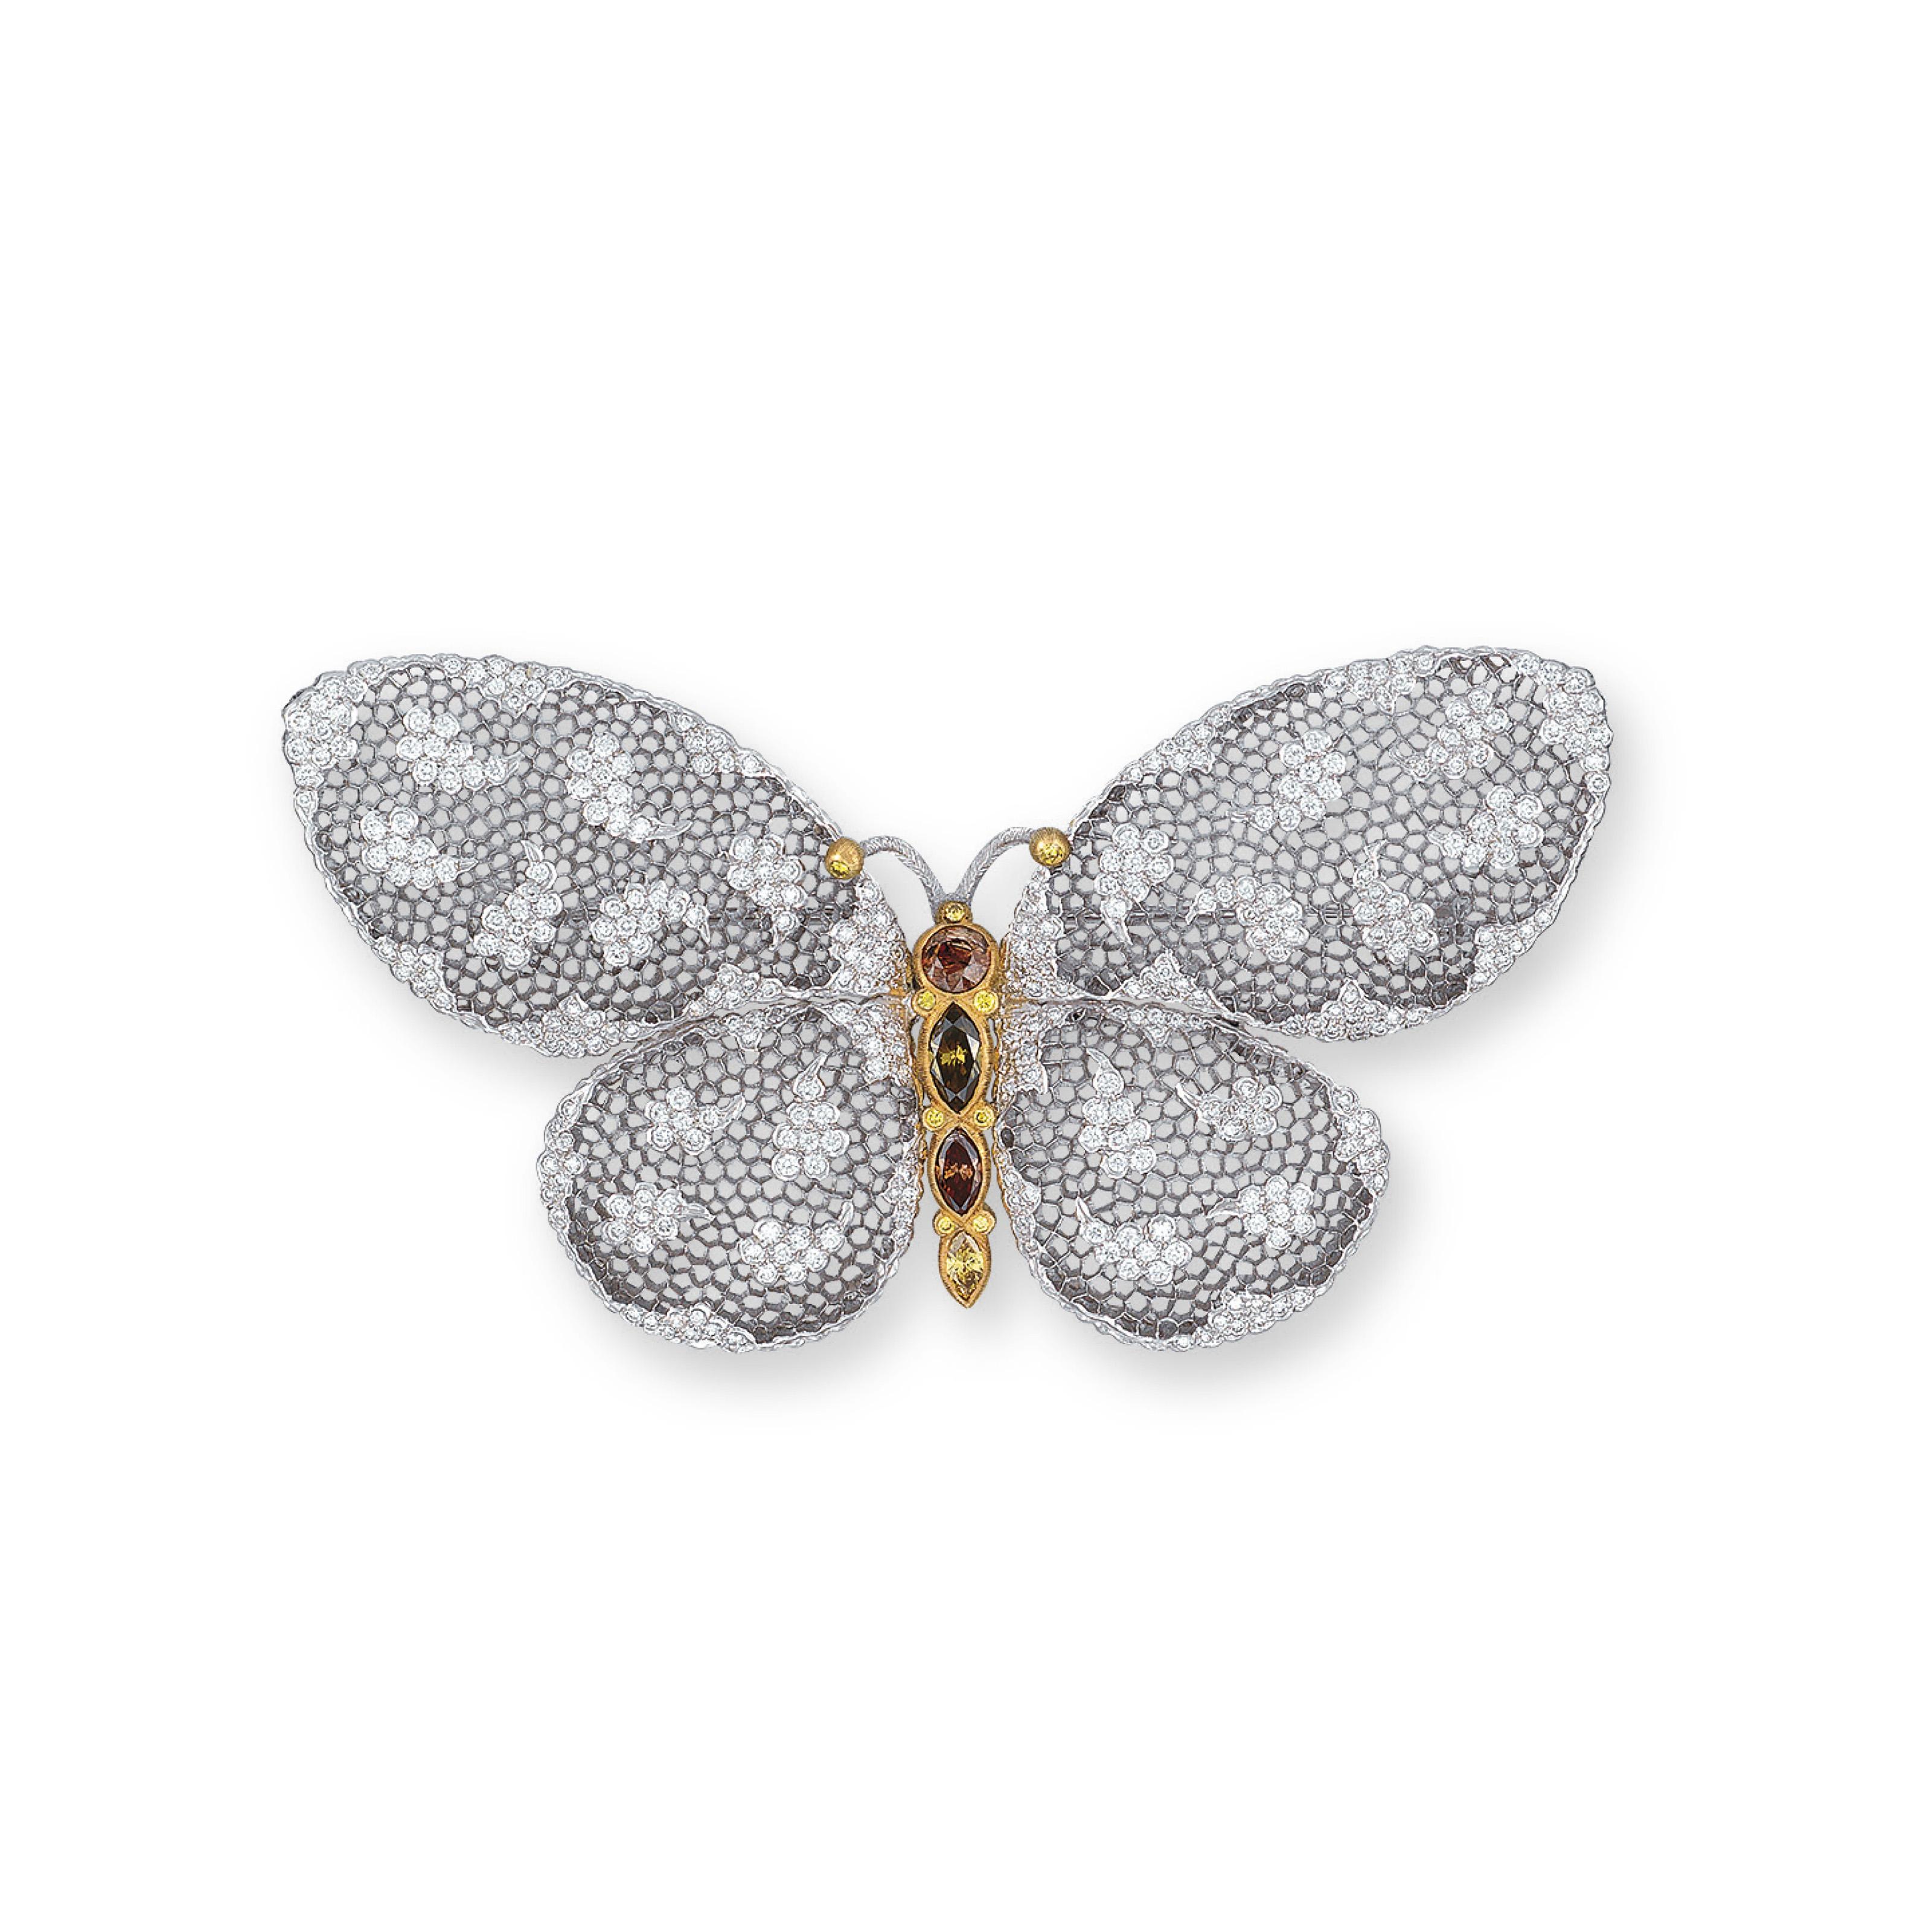 A DIAMOND AND COLOURED DIAMOND BROOCH, BY BUCCELLATI